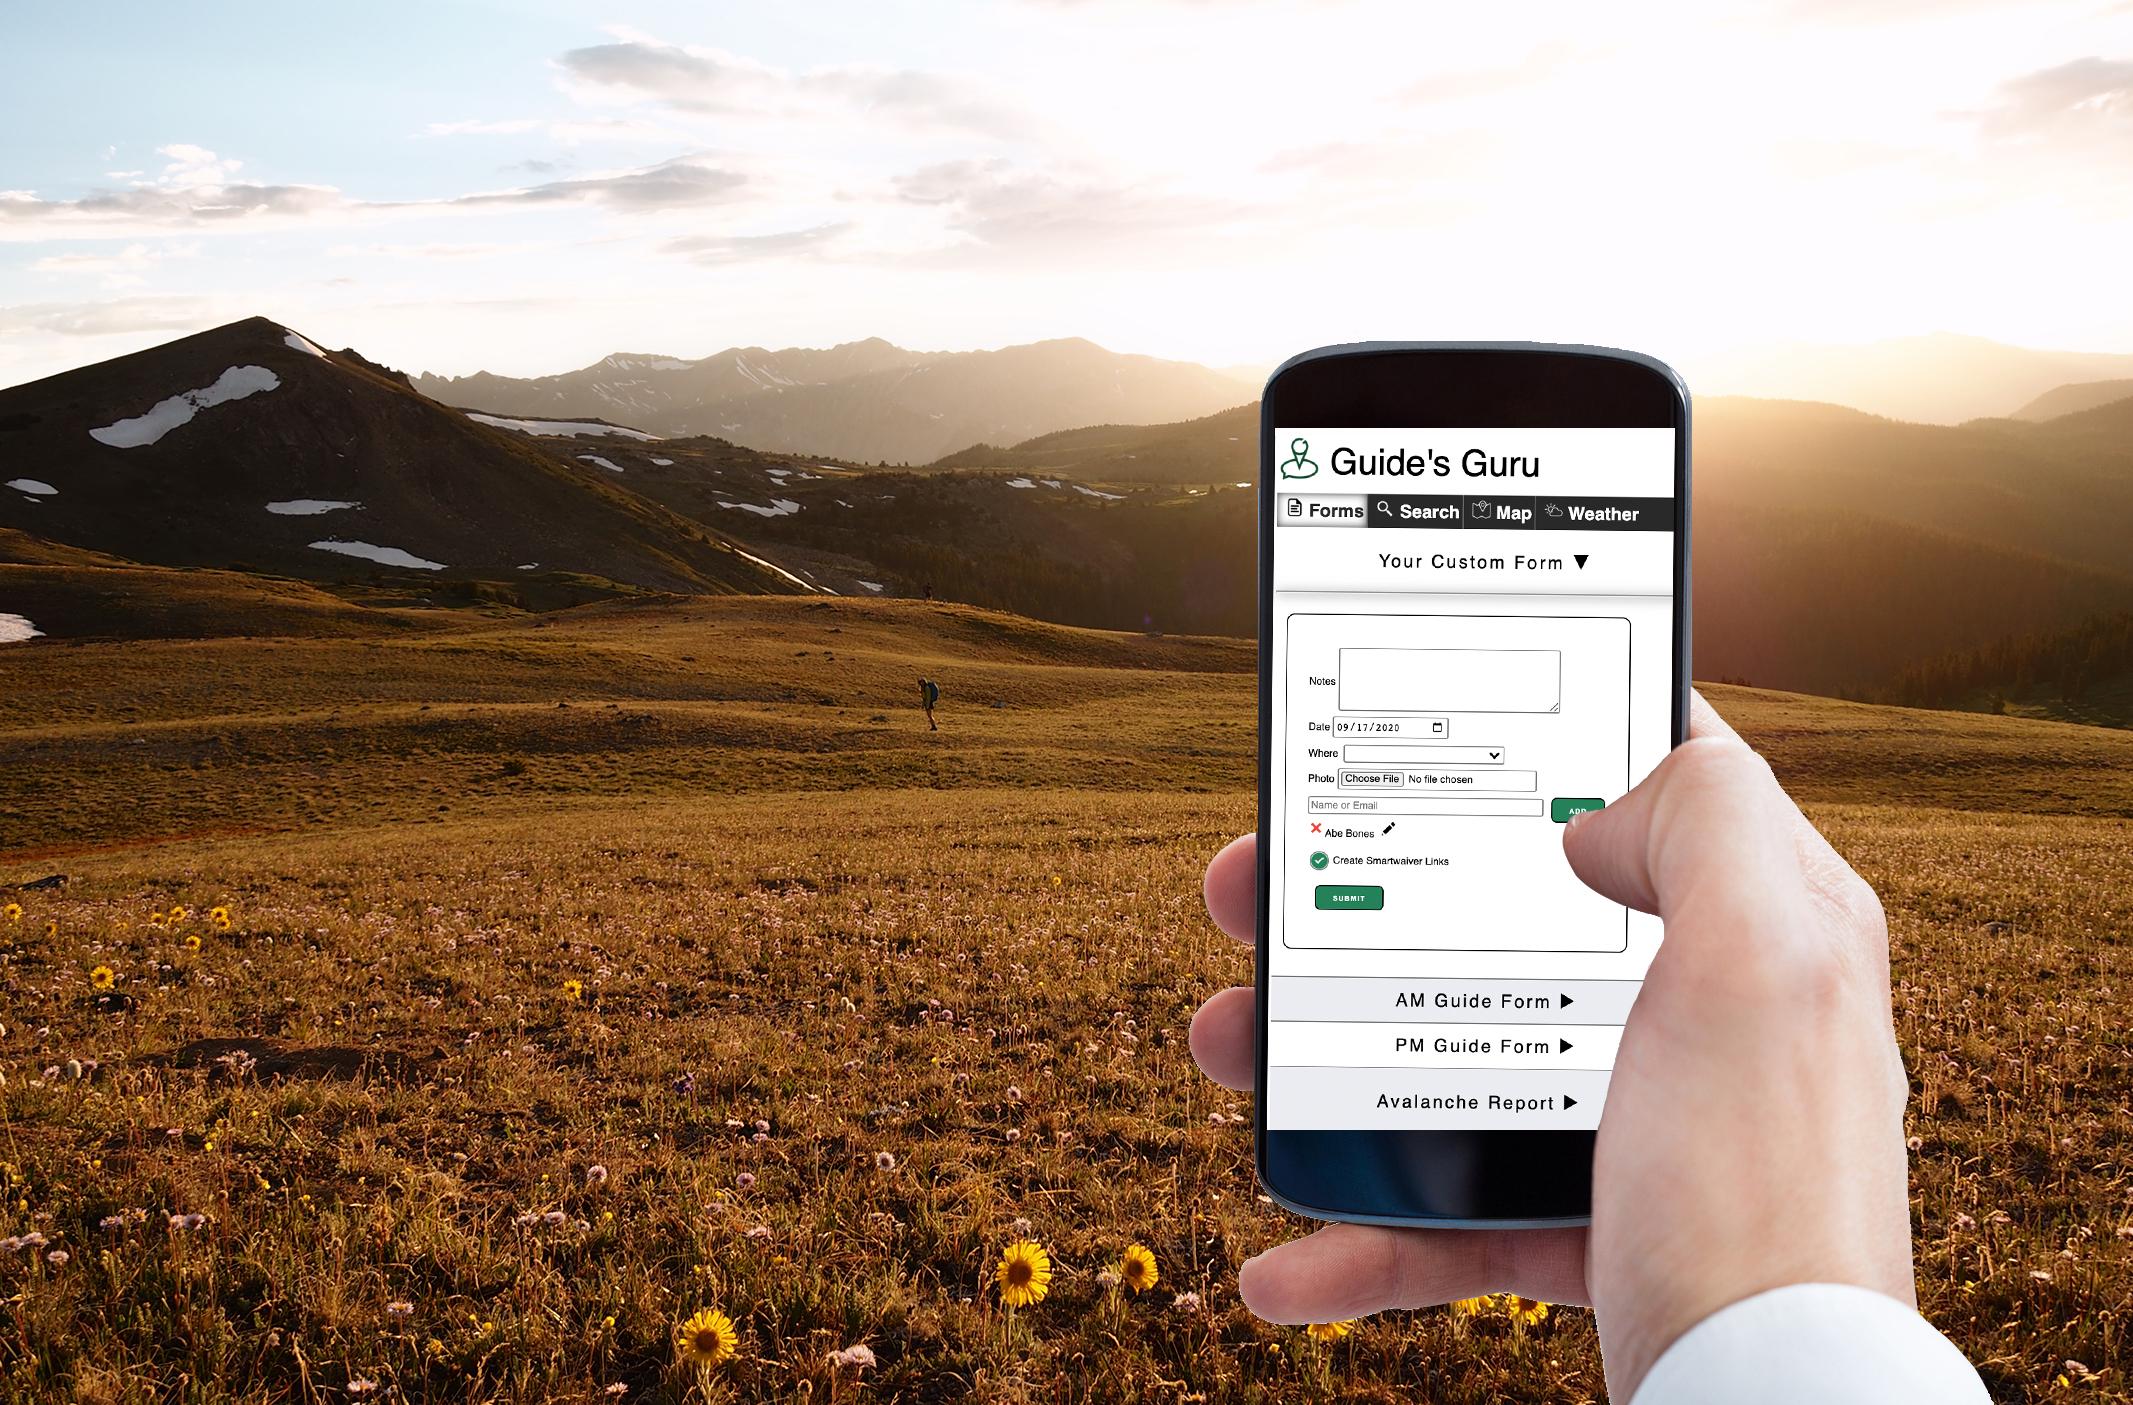 guides guru, software for outdoor guiding companies, digital services for outdoor guiding companies